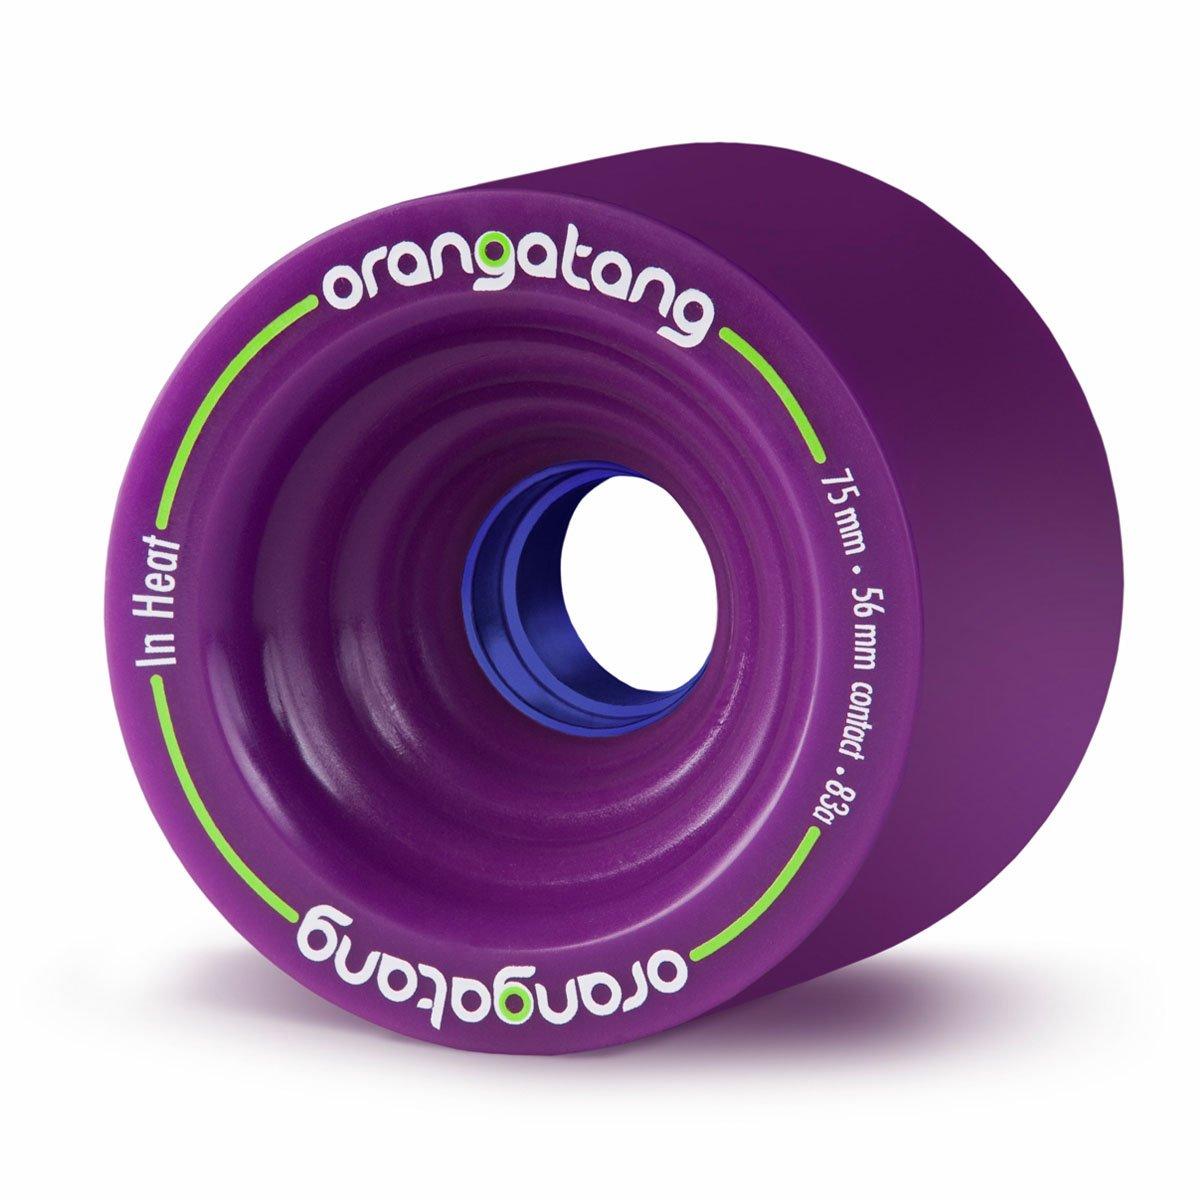 Orangatang in Heat 75 mm 83a Downhill Longboard Skateboard Cruising Wheels w/Loaded Jehu V2 Bearings (Purple, Set of 4) by Orangatang